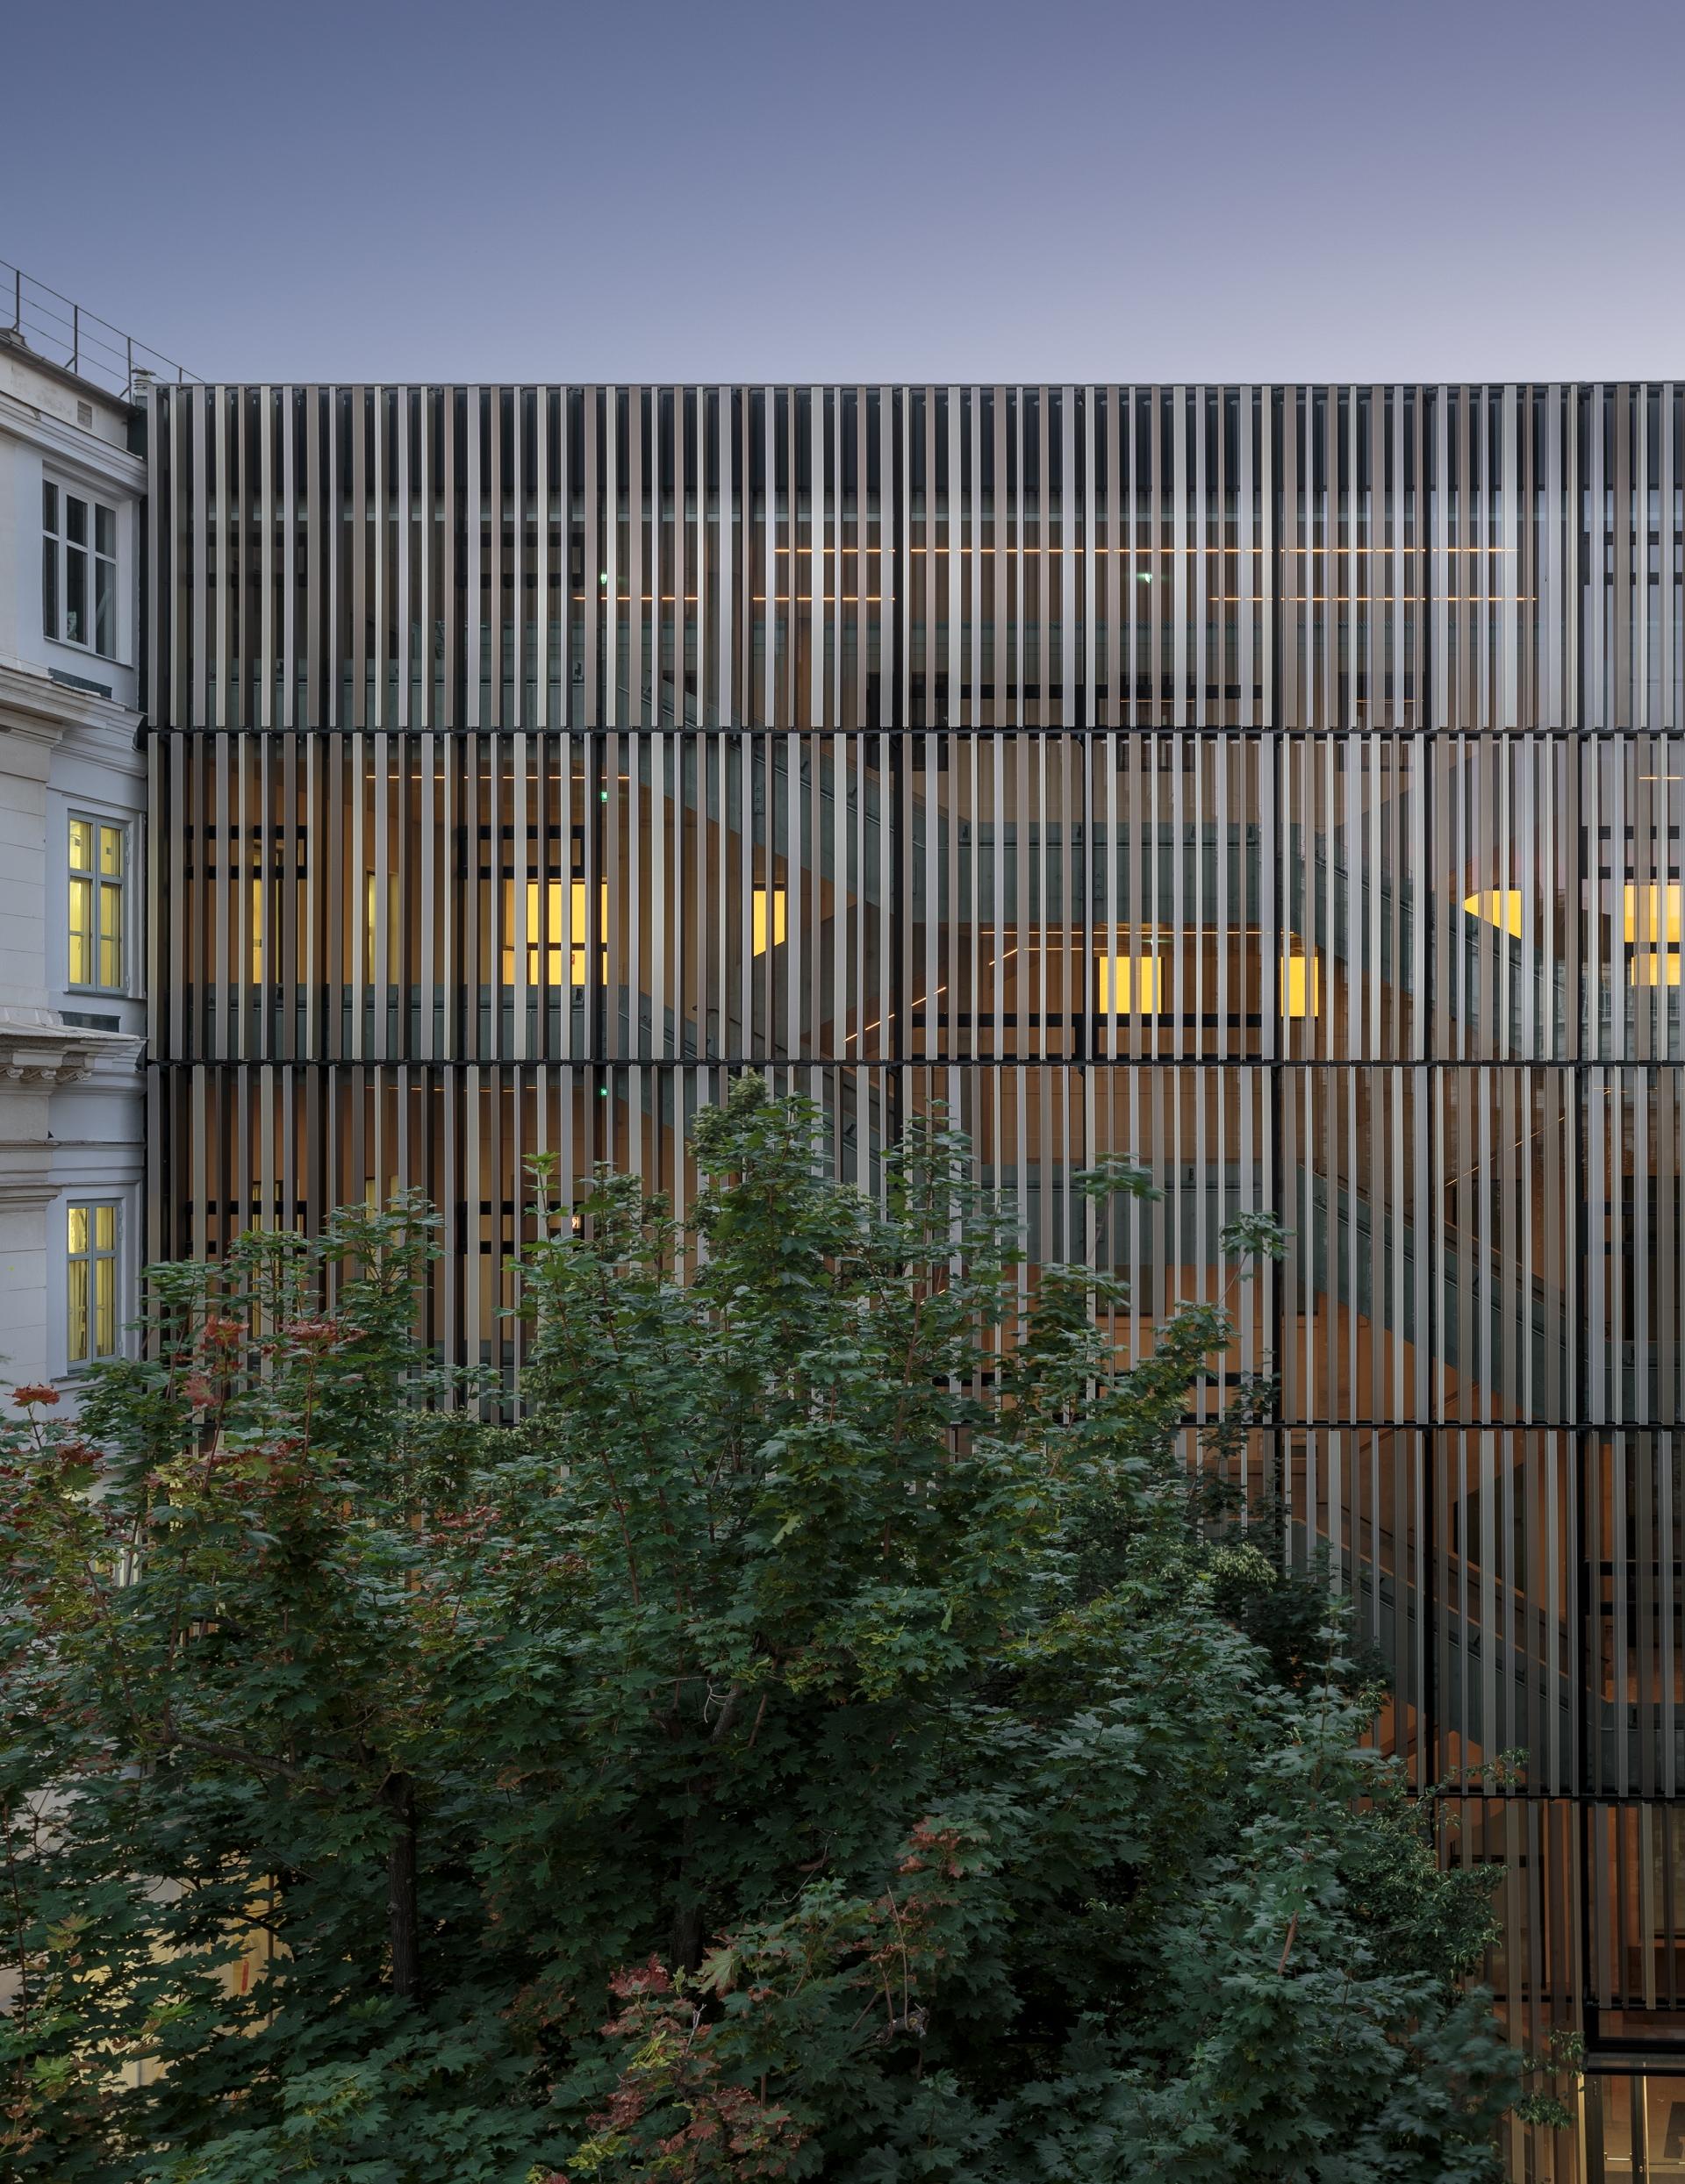 MAXIMILIAN HAIDACHER / PHOTOGRAPHY Technische Universität Wien, Stiege 10